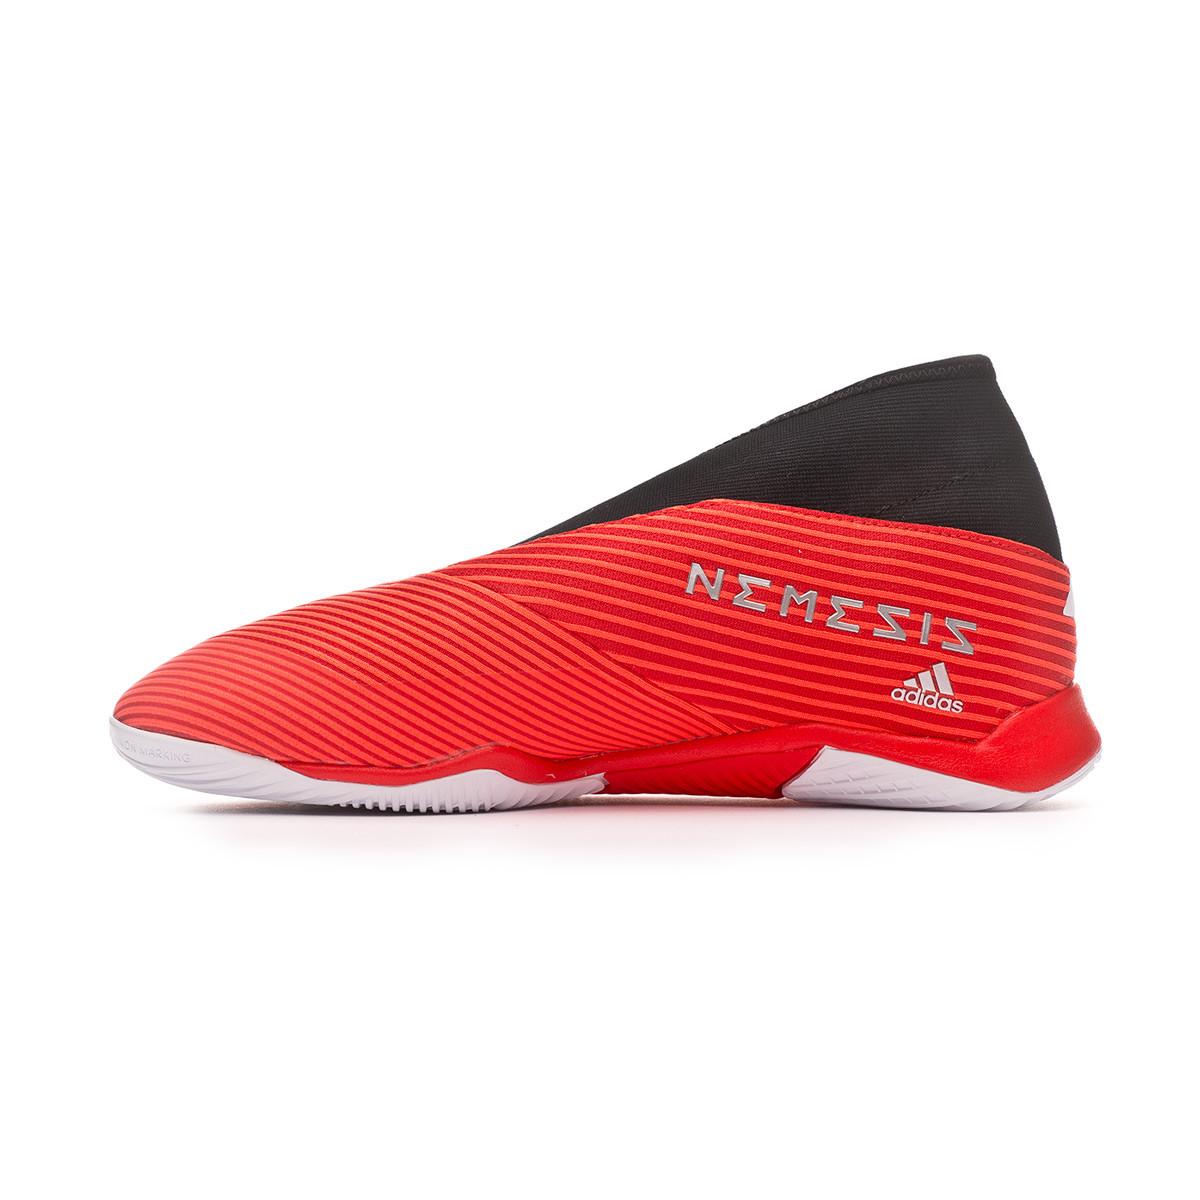 Chaussure de futsal adidas Nemeziz 19.3 Laceless IN